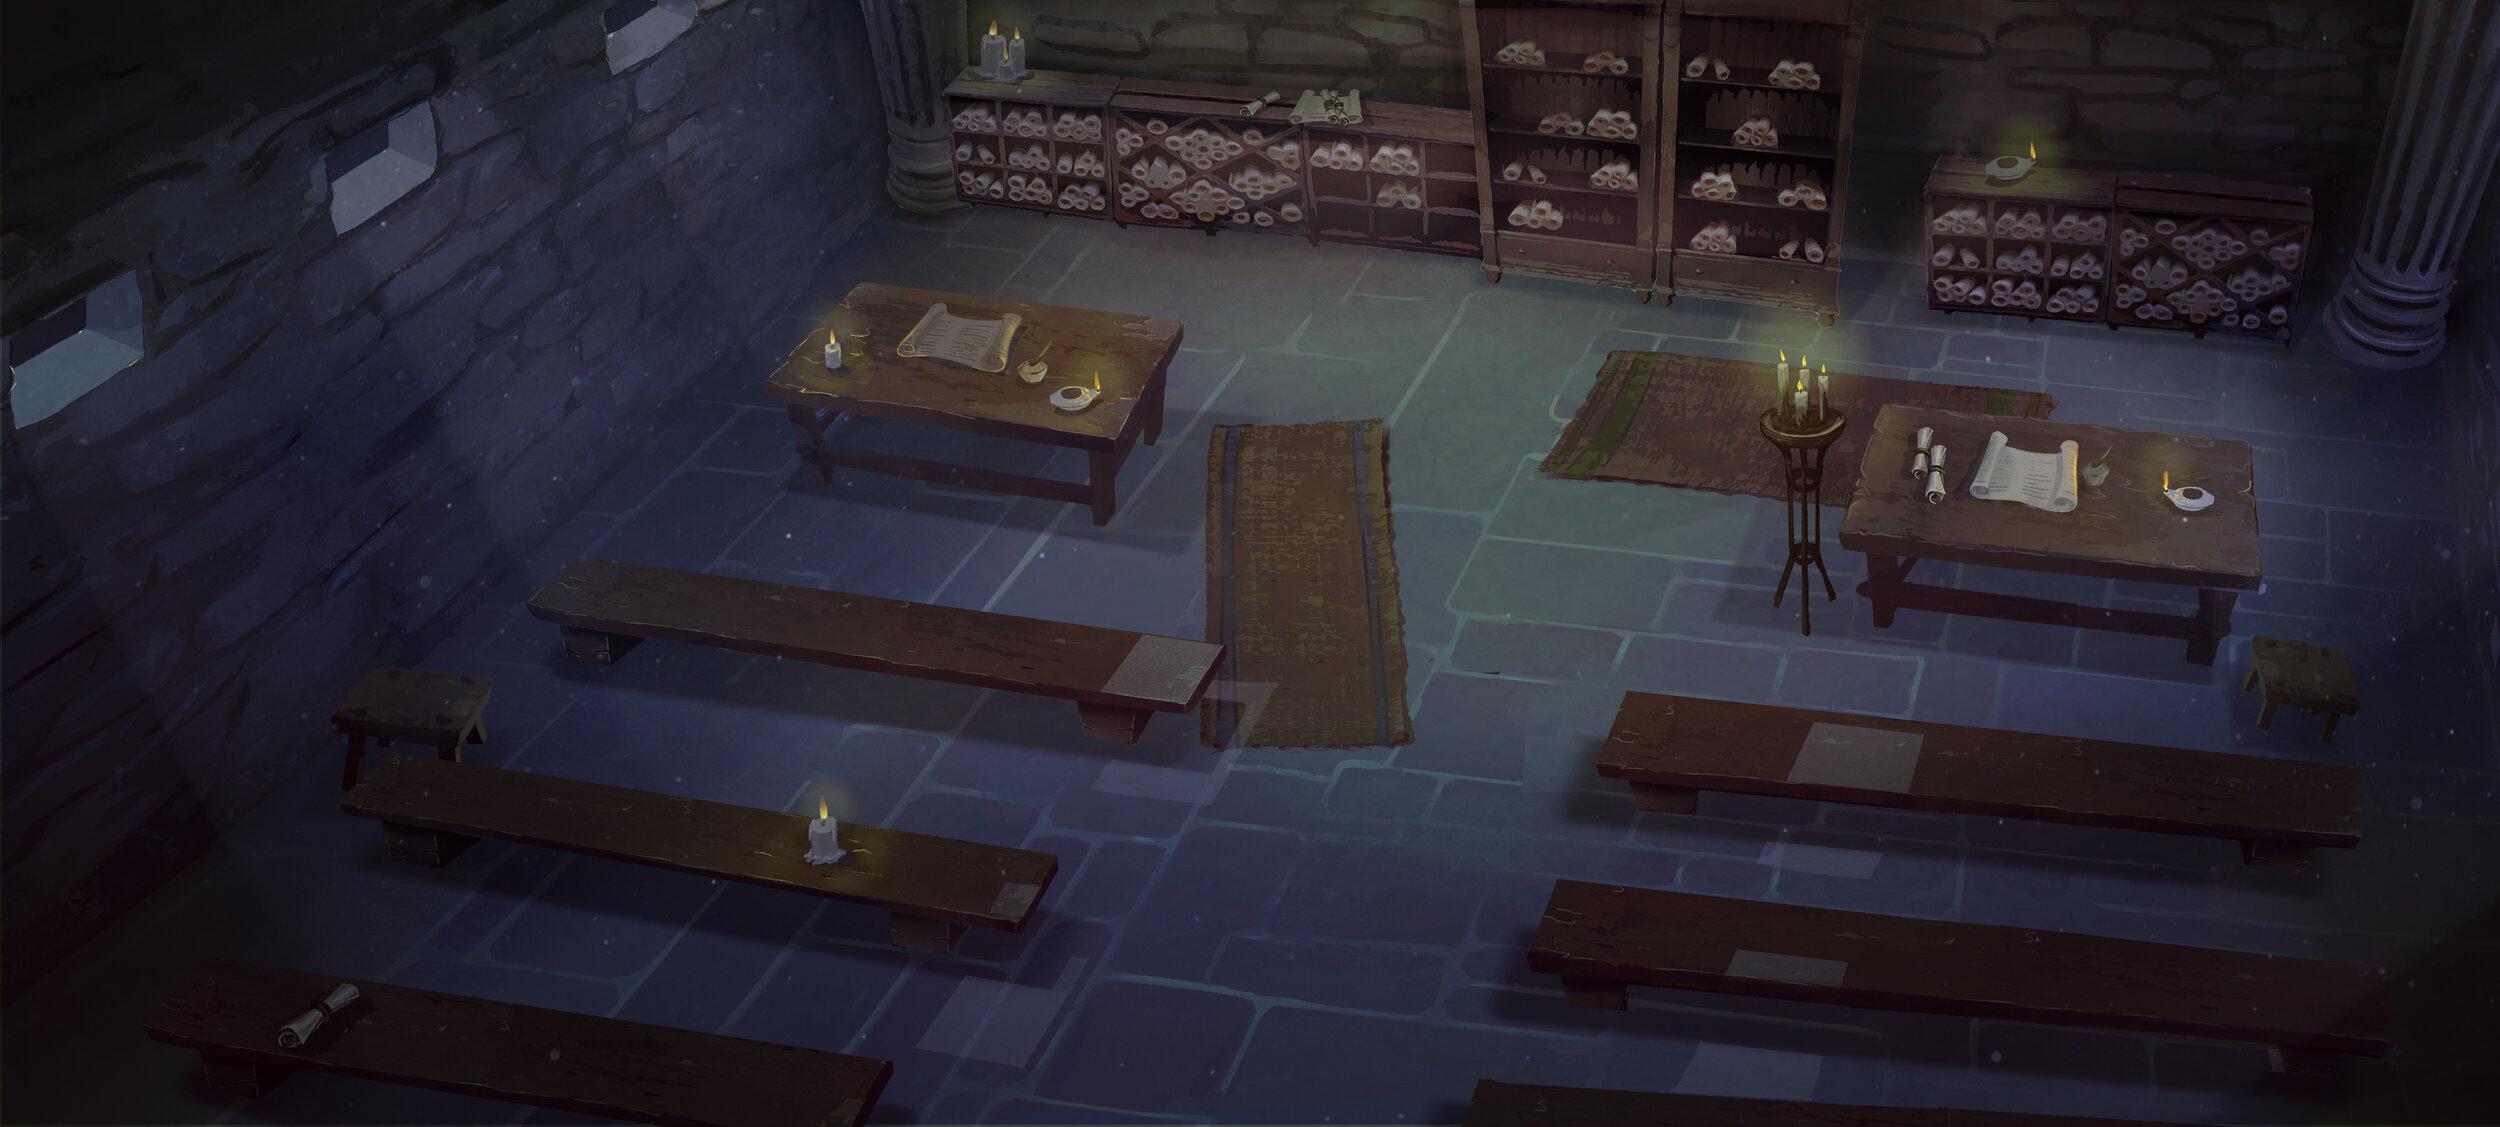 beit midrash interior2.jpg